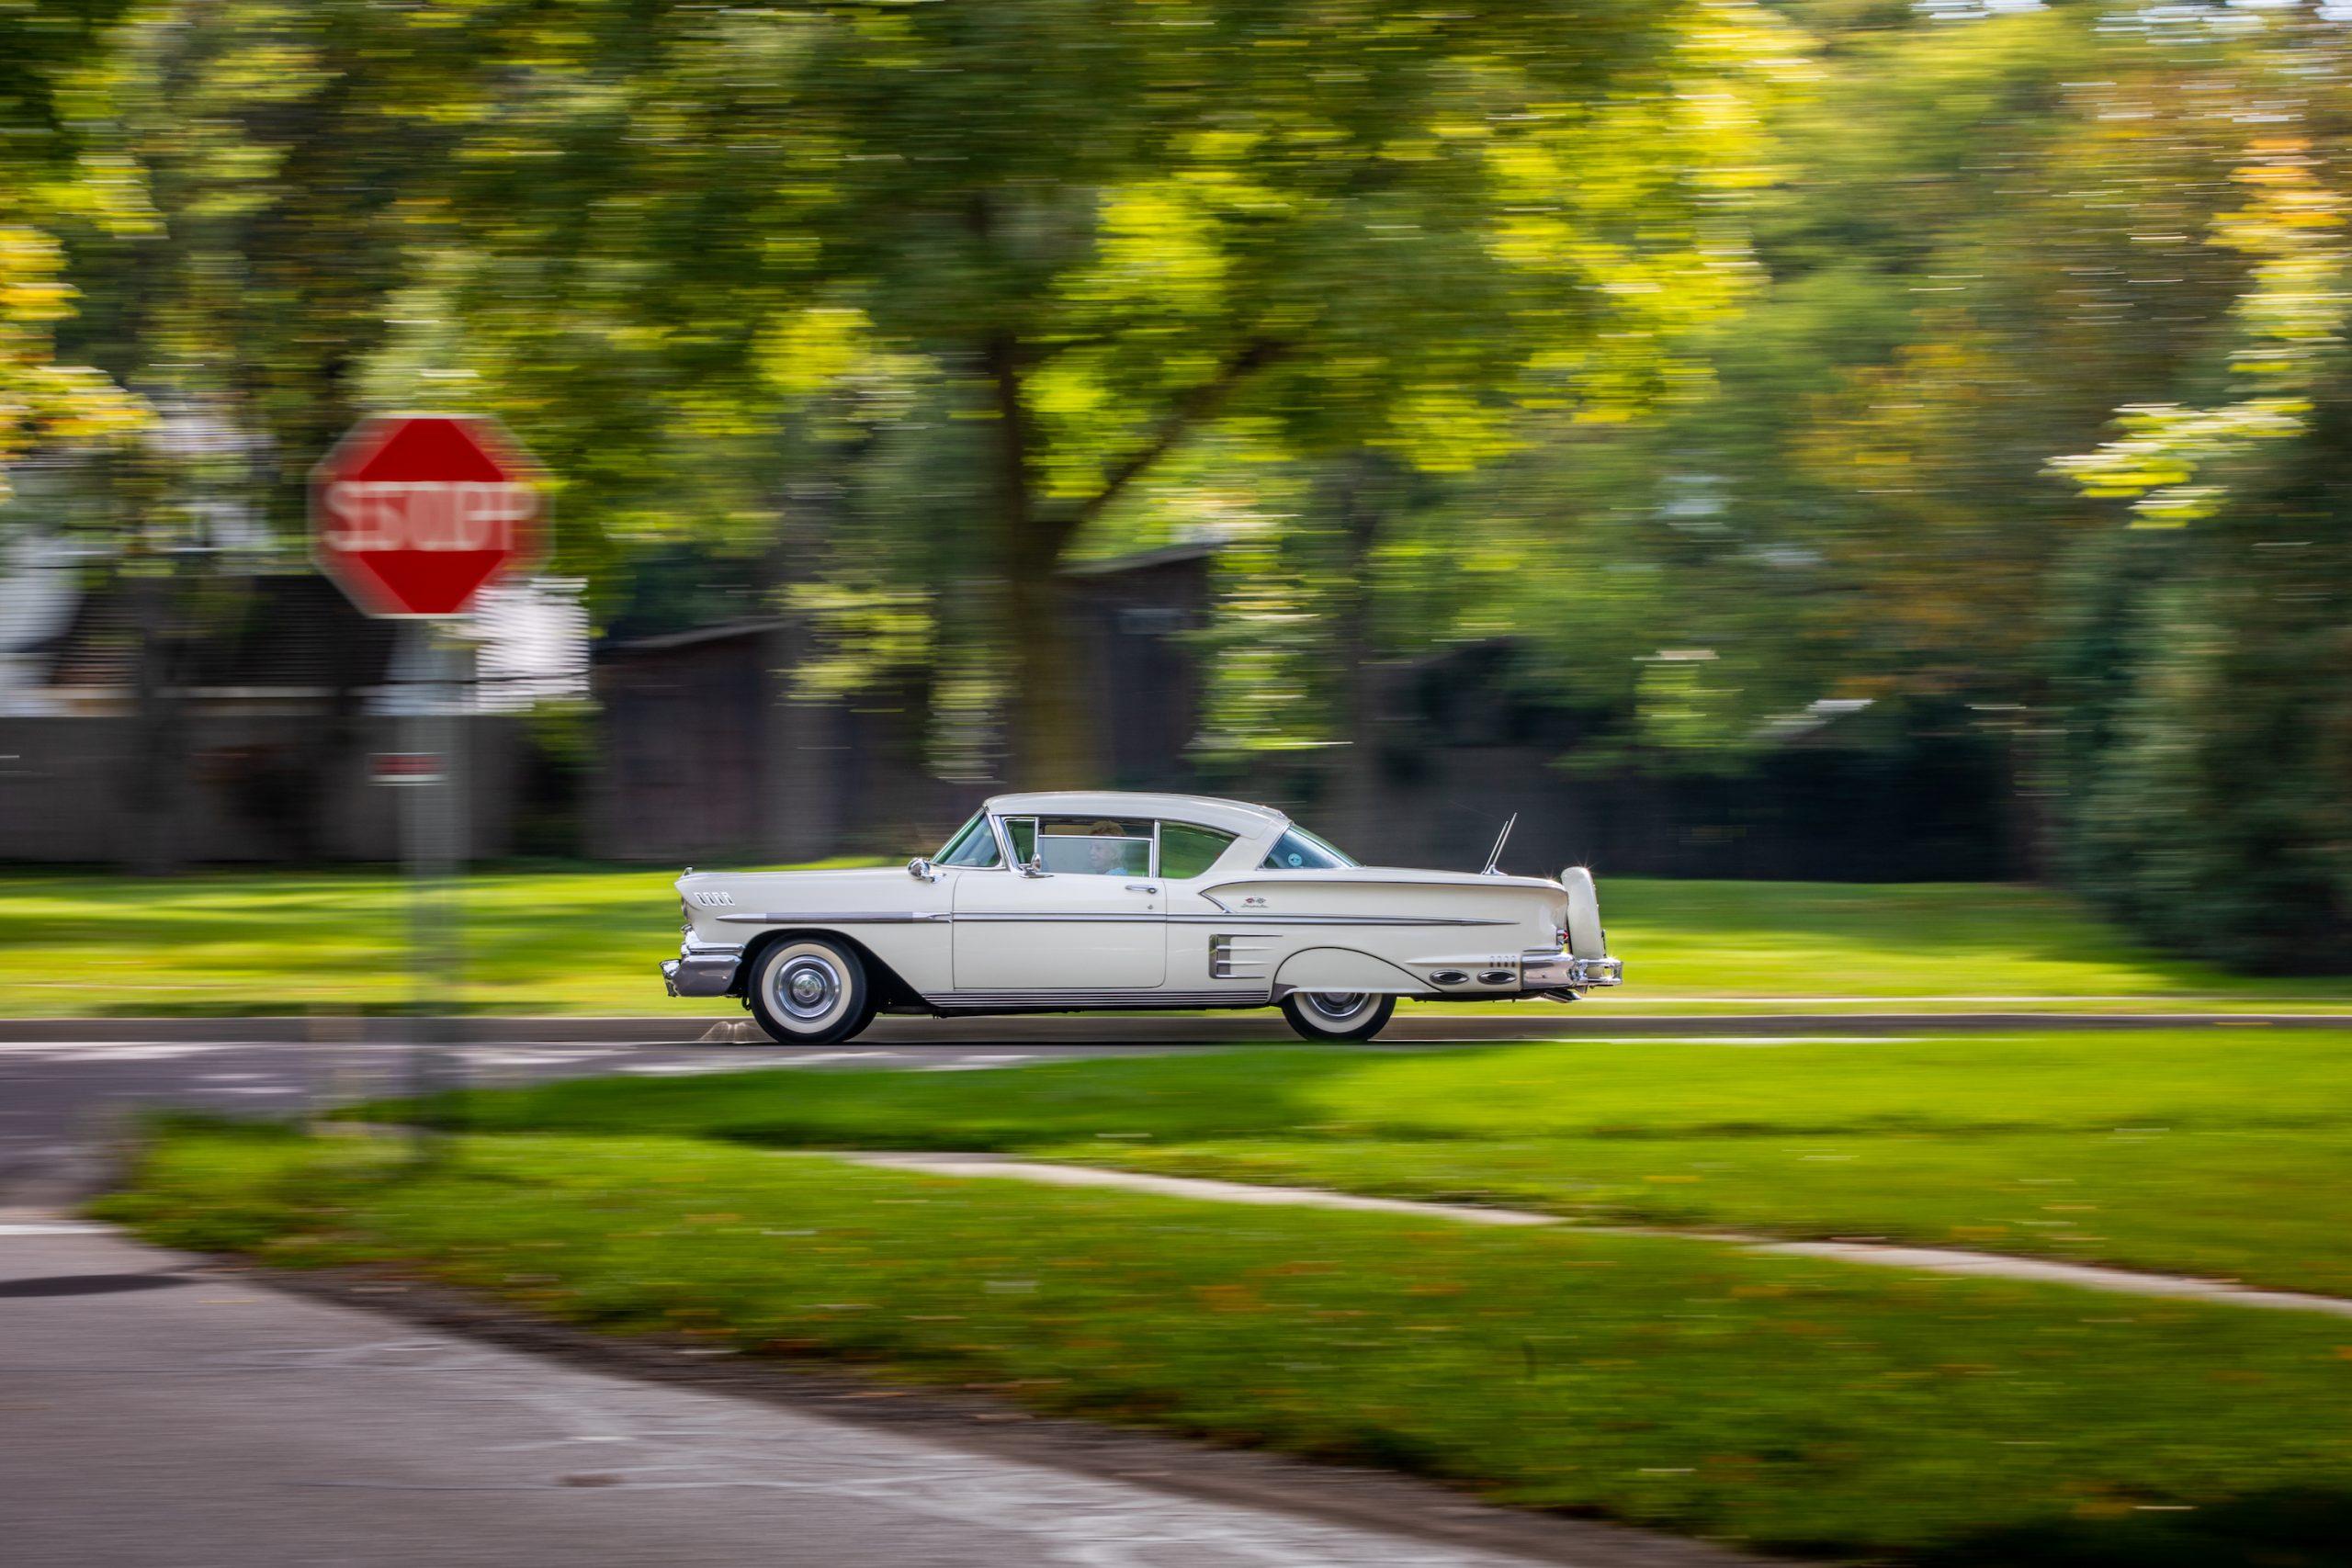 1958 Chevrolet Impala Side Profile Action